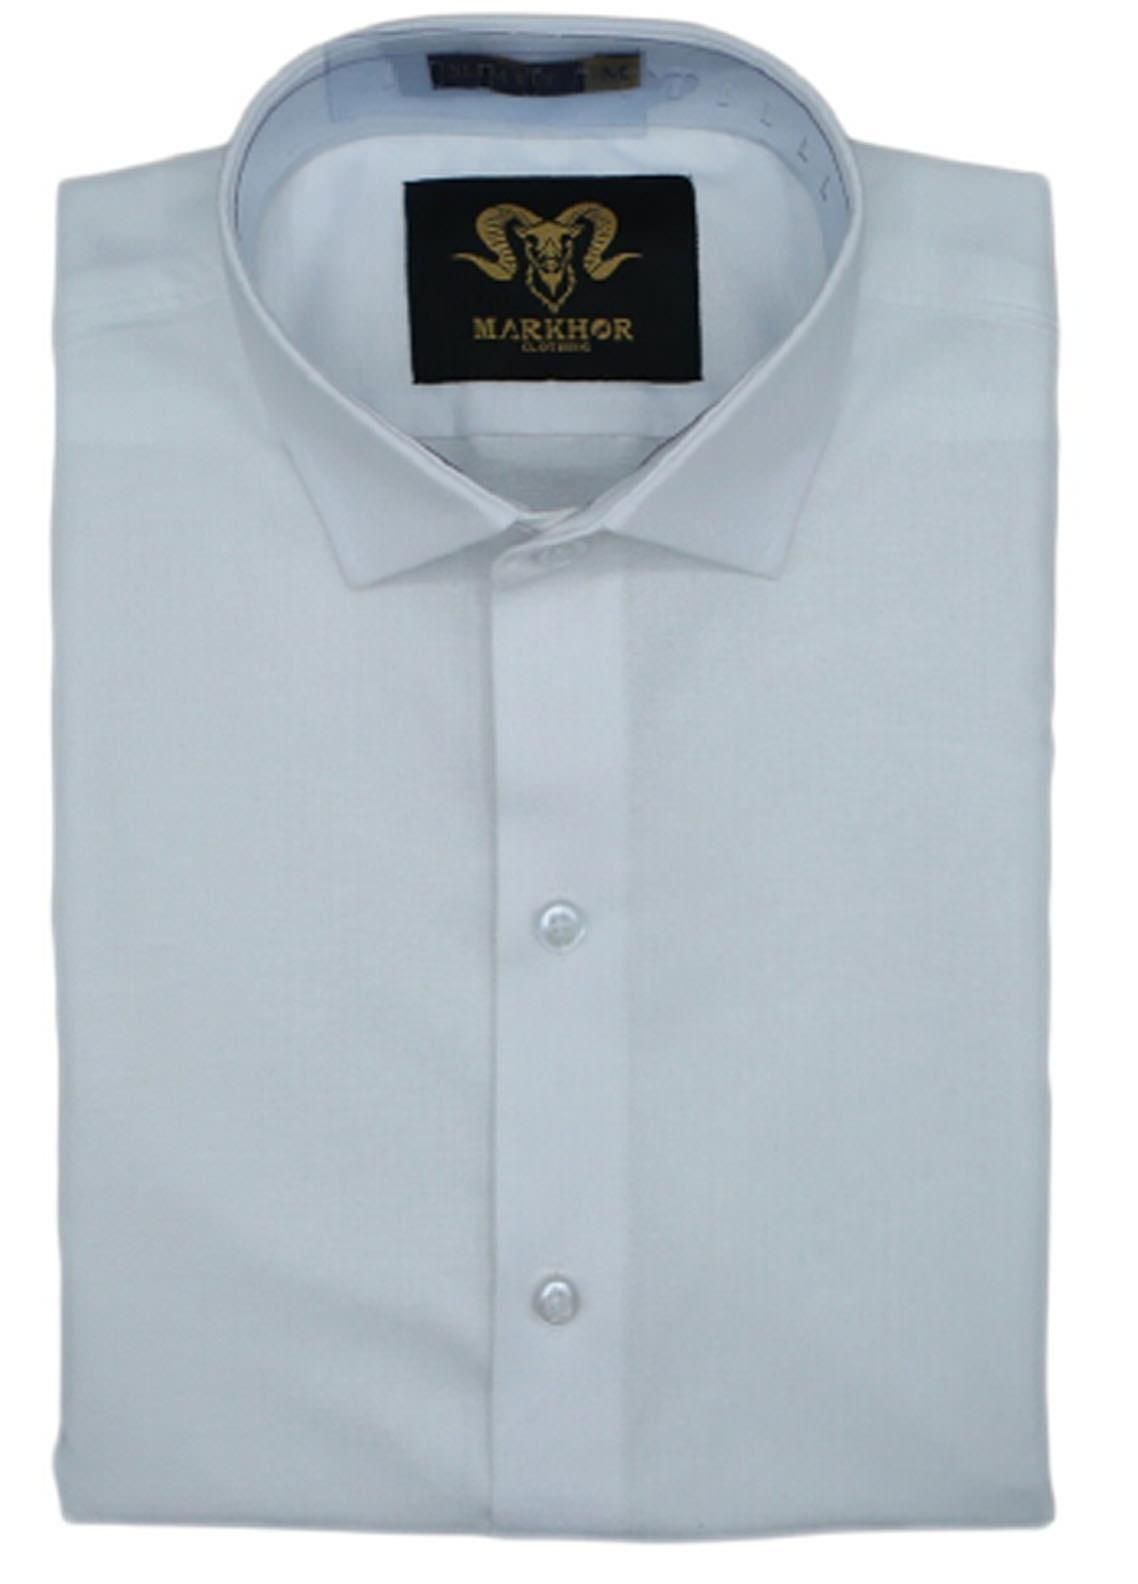 Markhor Clothing Chambray Cotton Formal Shirts for Men - White Royal  Chambray Cotton Slim Fit Formal Shirt